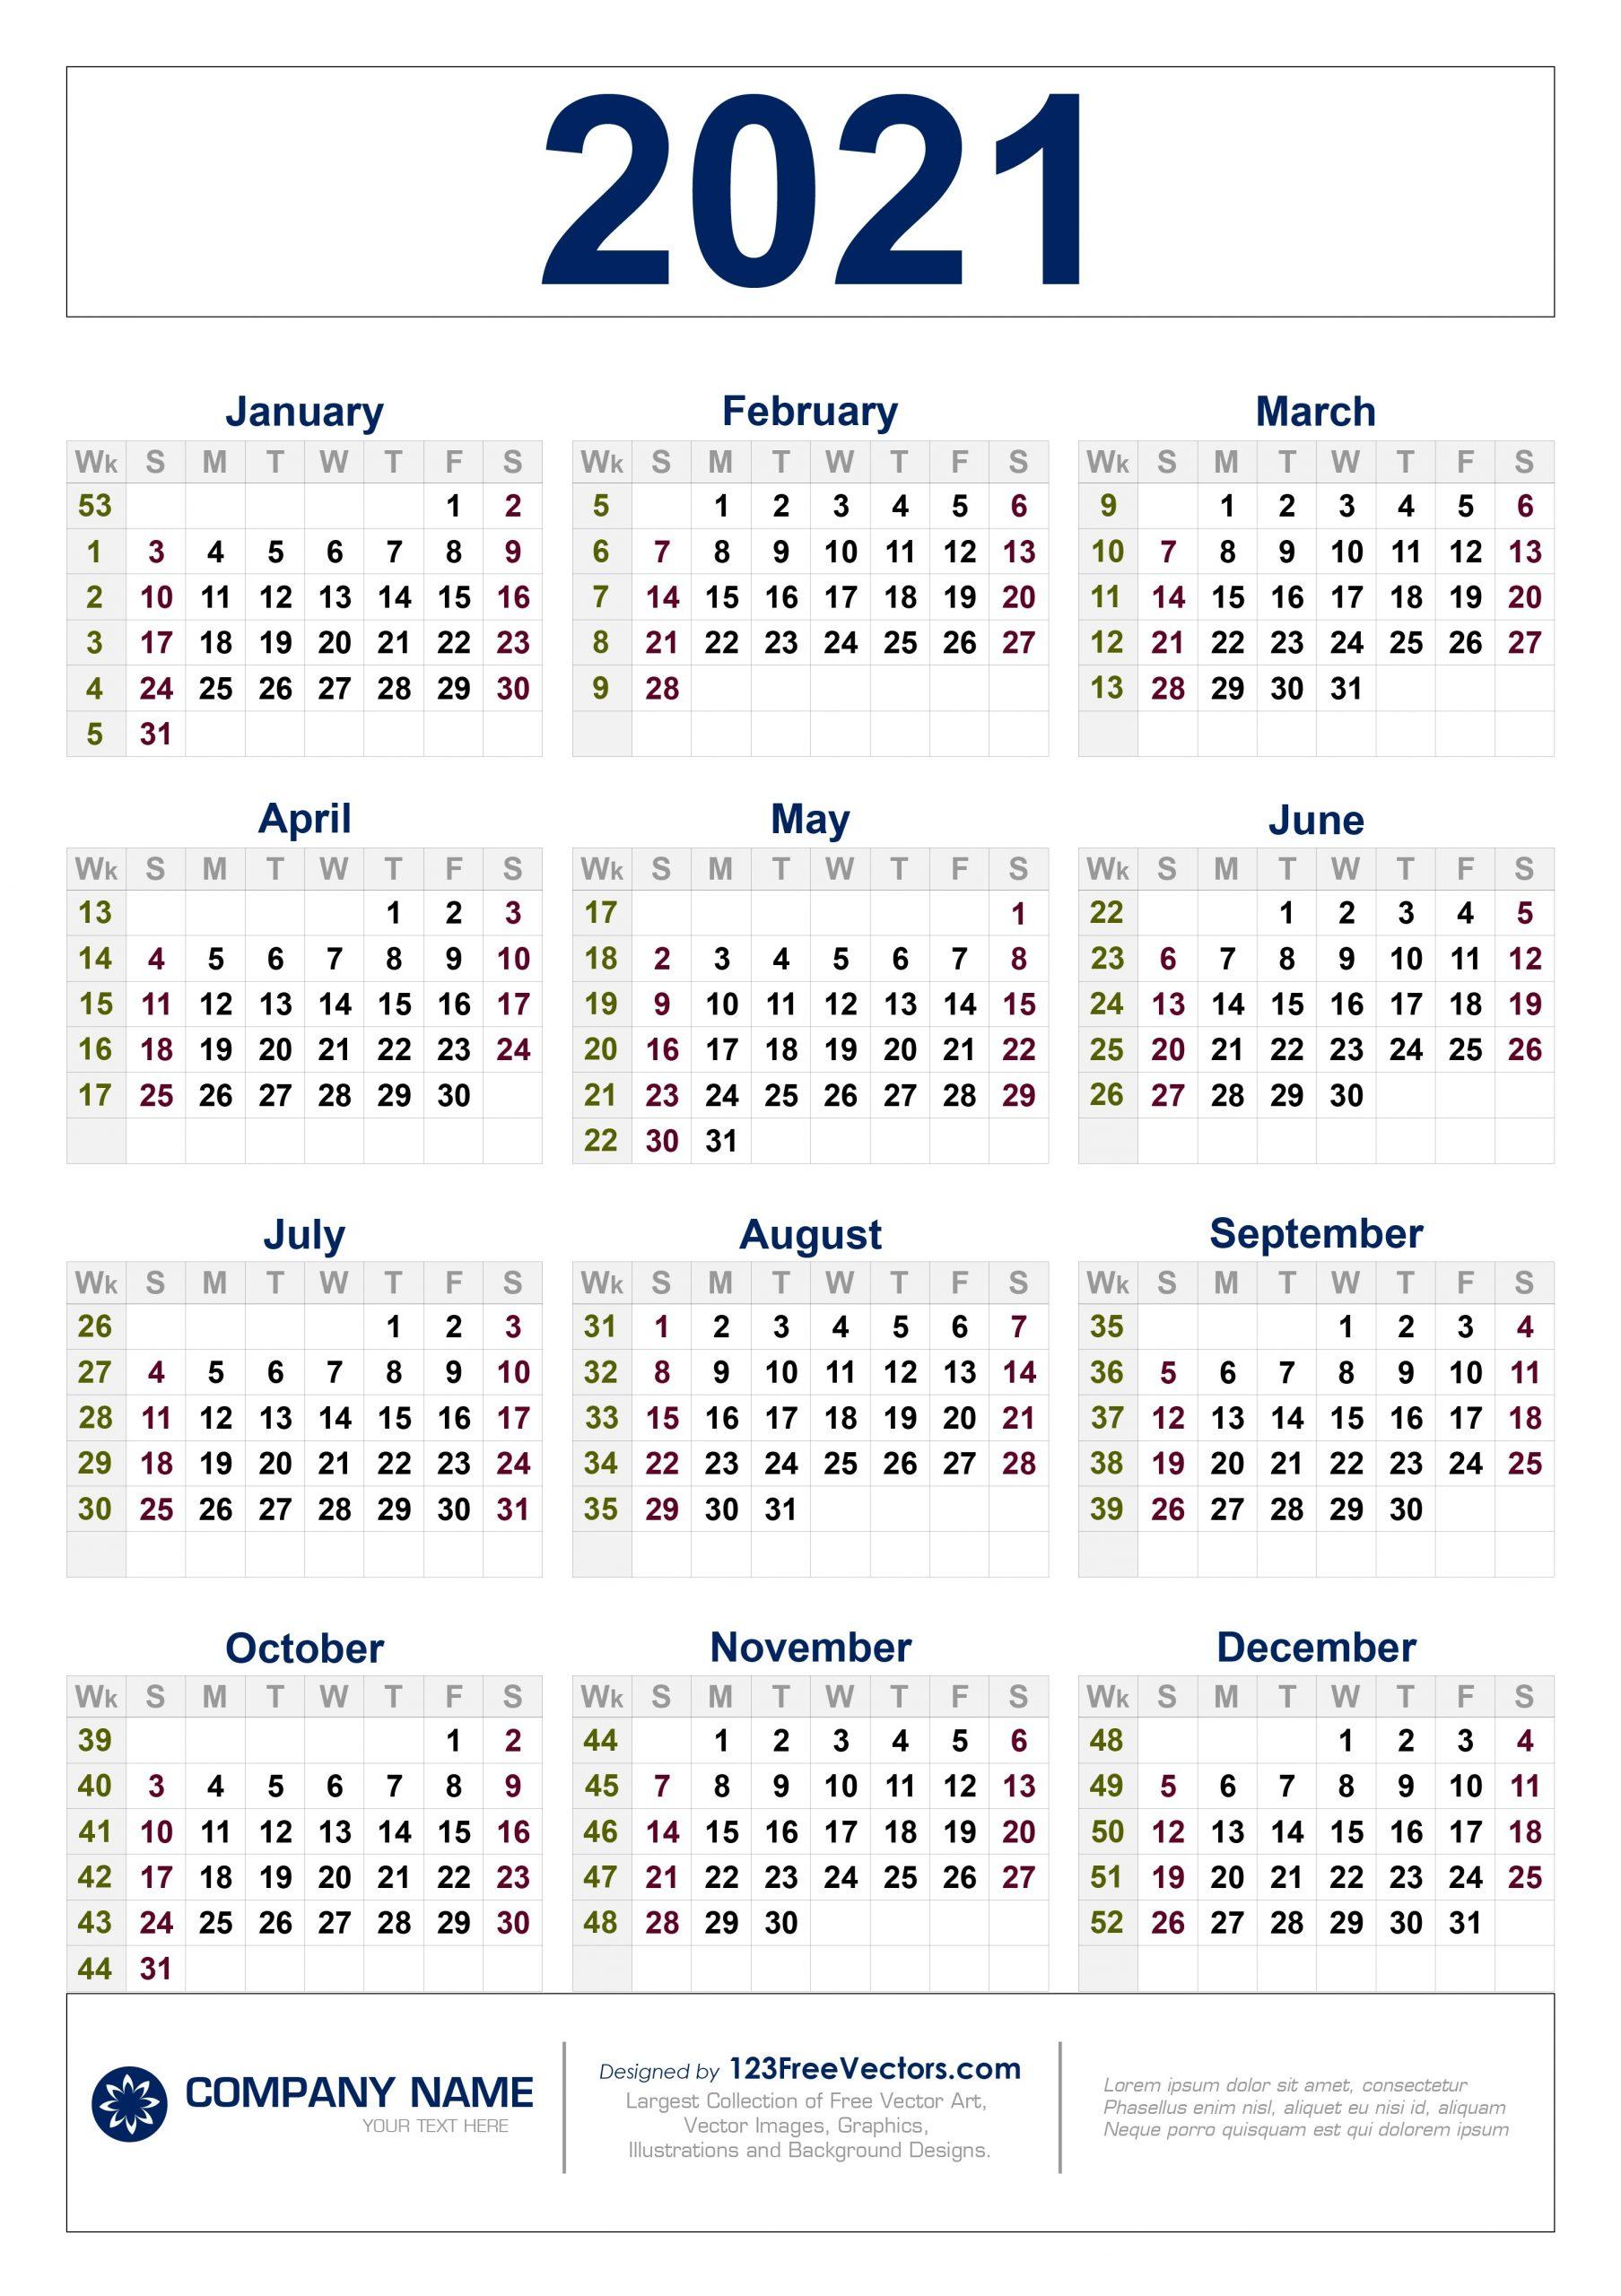 2021 Calendar Weeks Numbered - Template Calendar Design